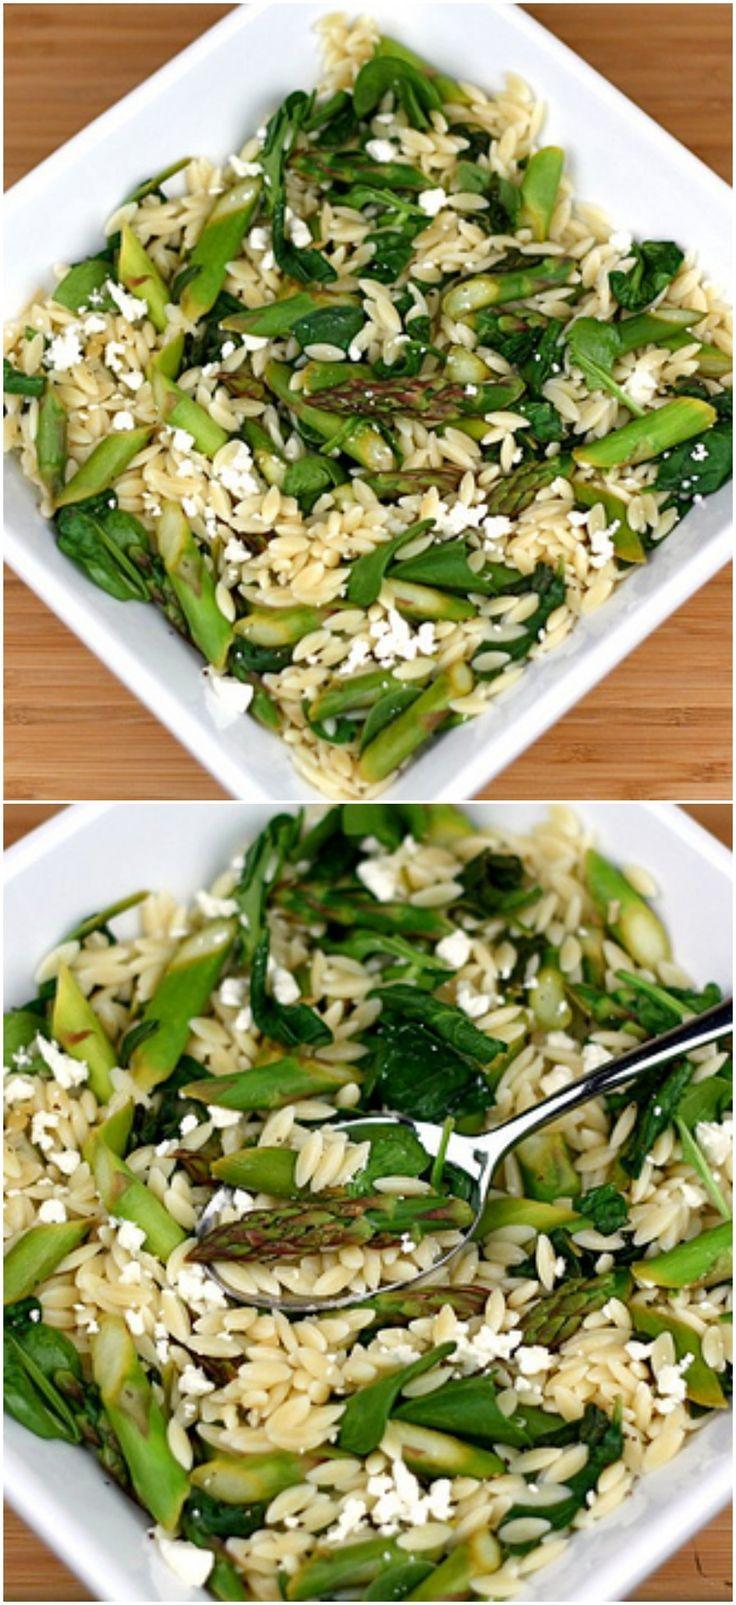 Lemon Orzo Salad with Asparagus, Spinach, and Feta on twopeasandtheirpod.com. Love this fresh and healthy salad! #salad #vegetarian